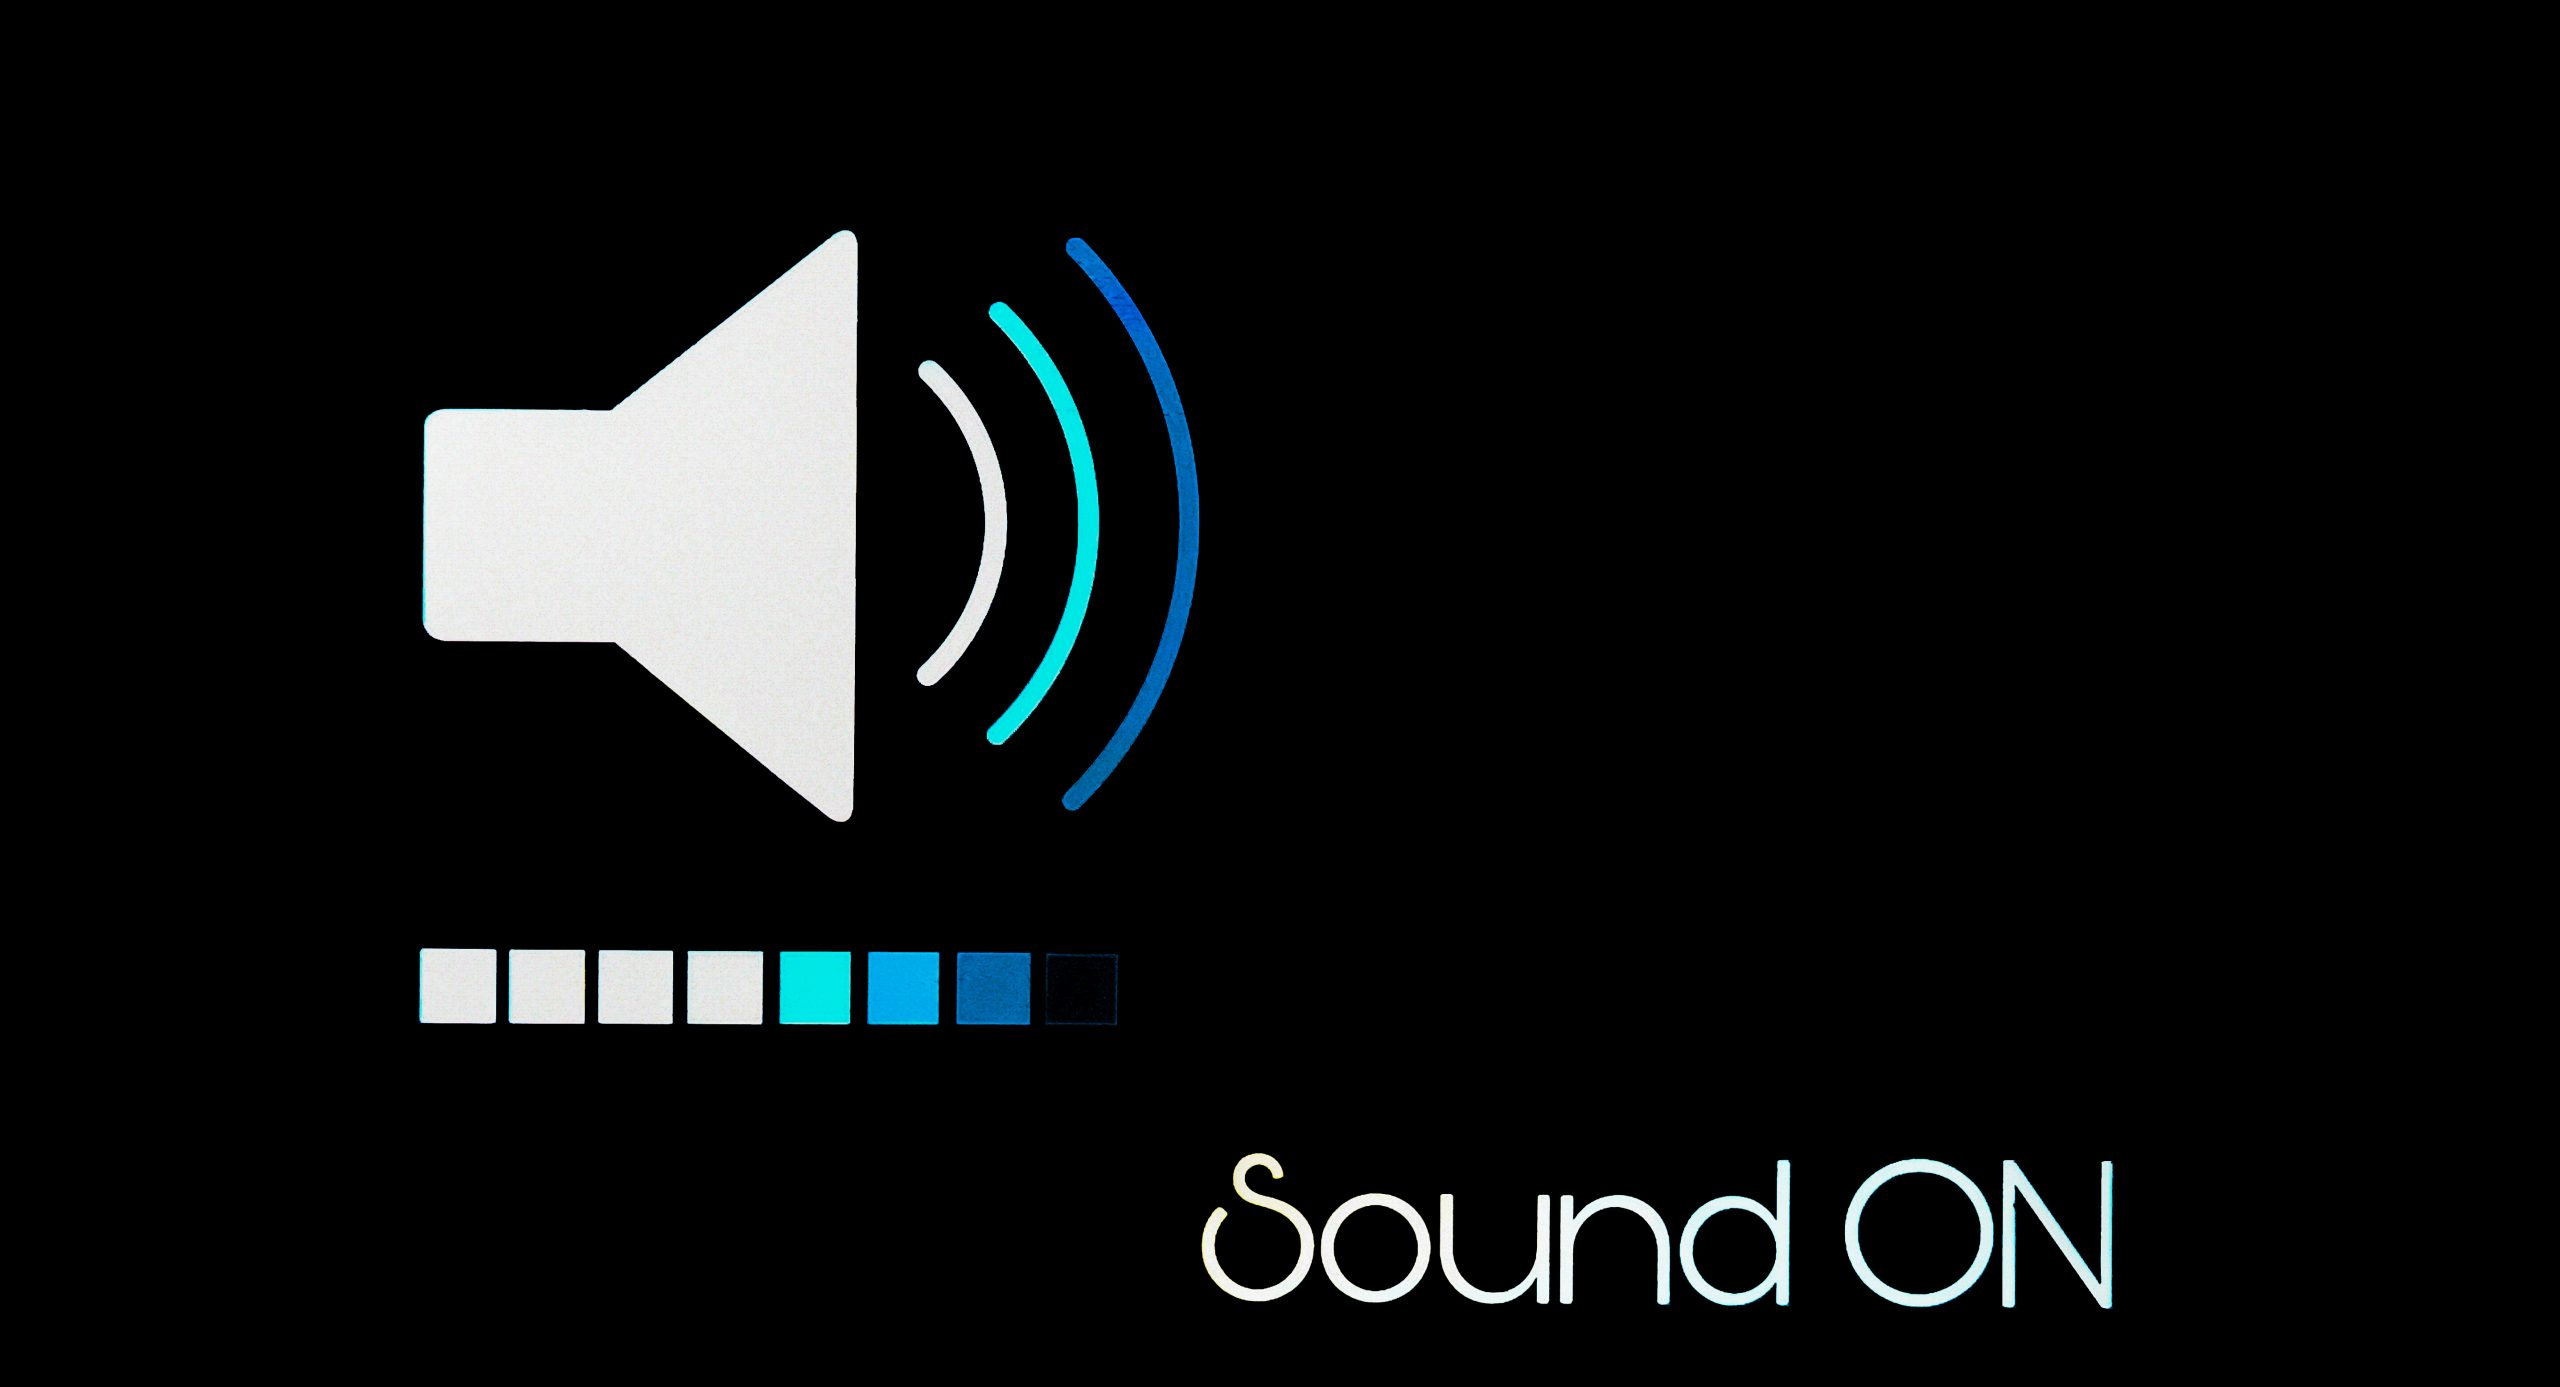 Sound ON illustration